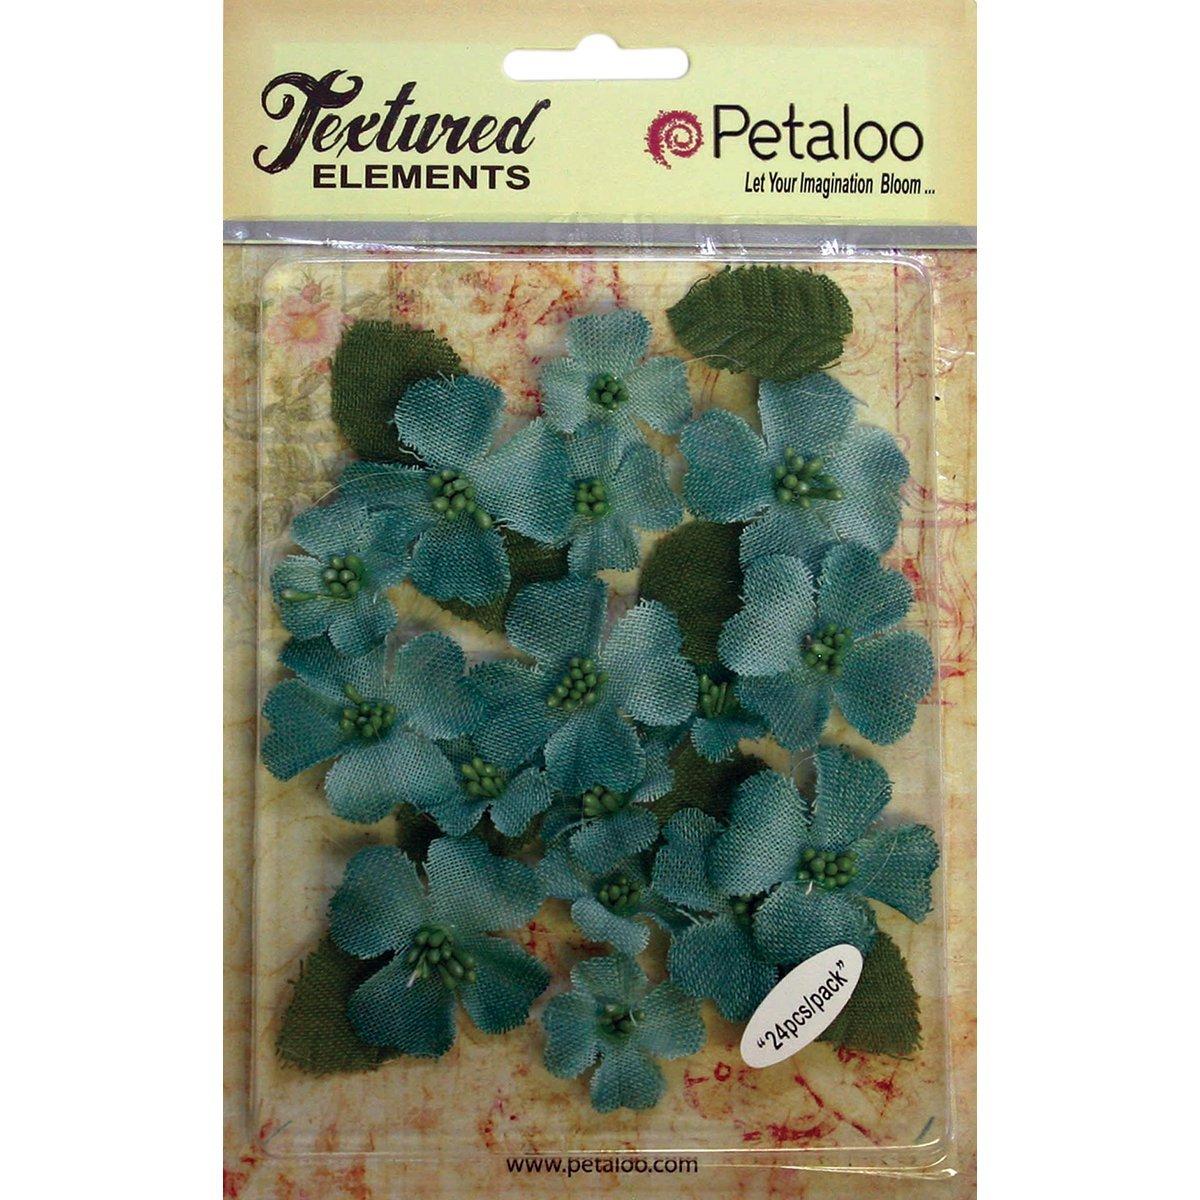 PETALOO 1211-253 Textured Elements canvas Dogwood Blossoms 1 - 1.5 24/Pkg-Antique Blue by PETALOO B01FGG2CSA